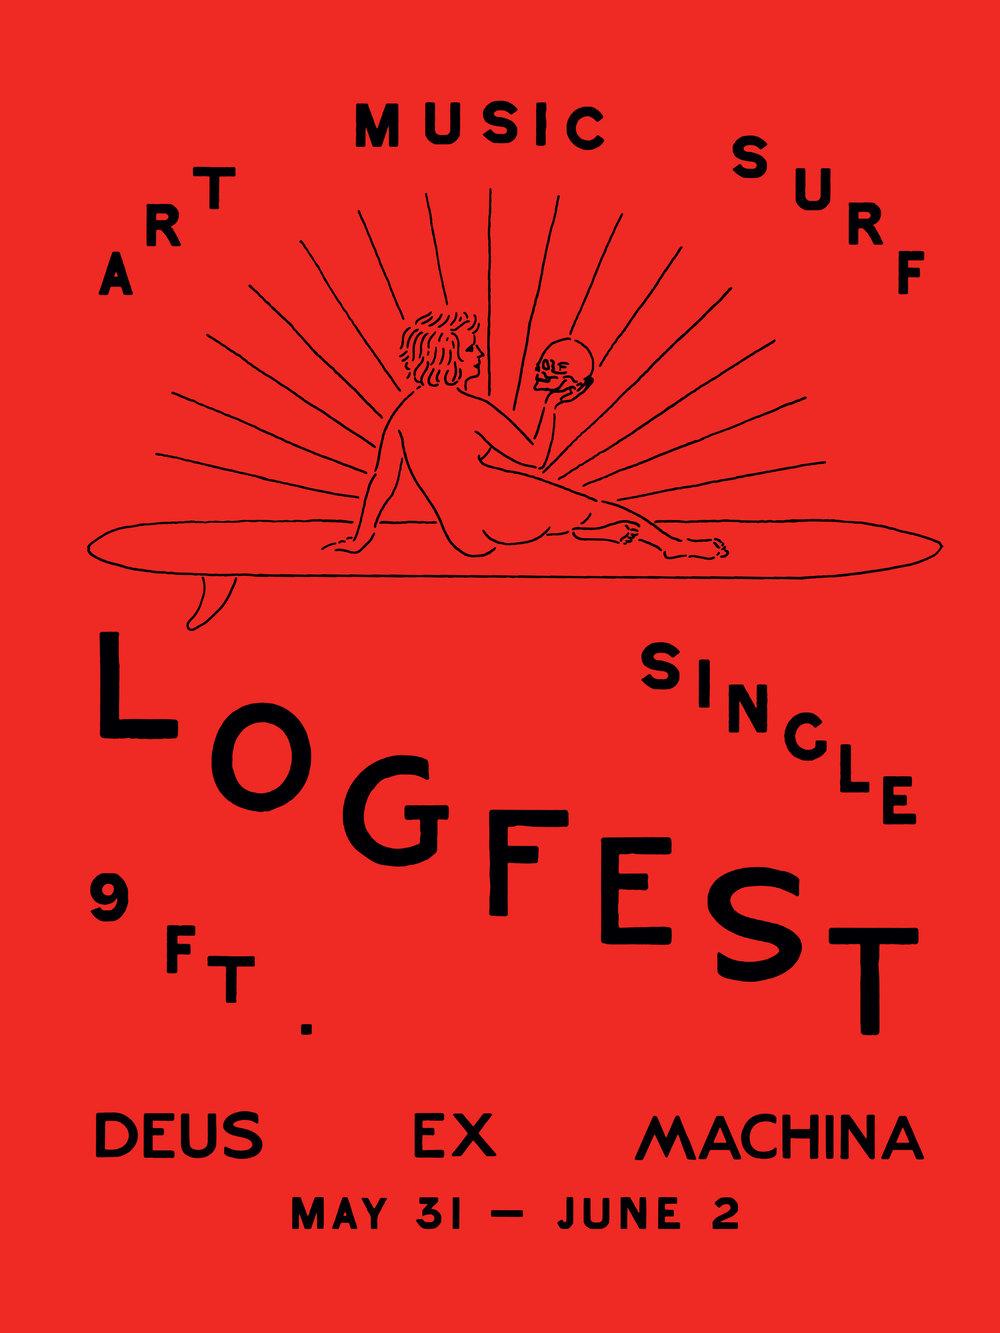 DEUS_logfest_2013.jpg